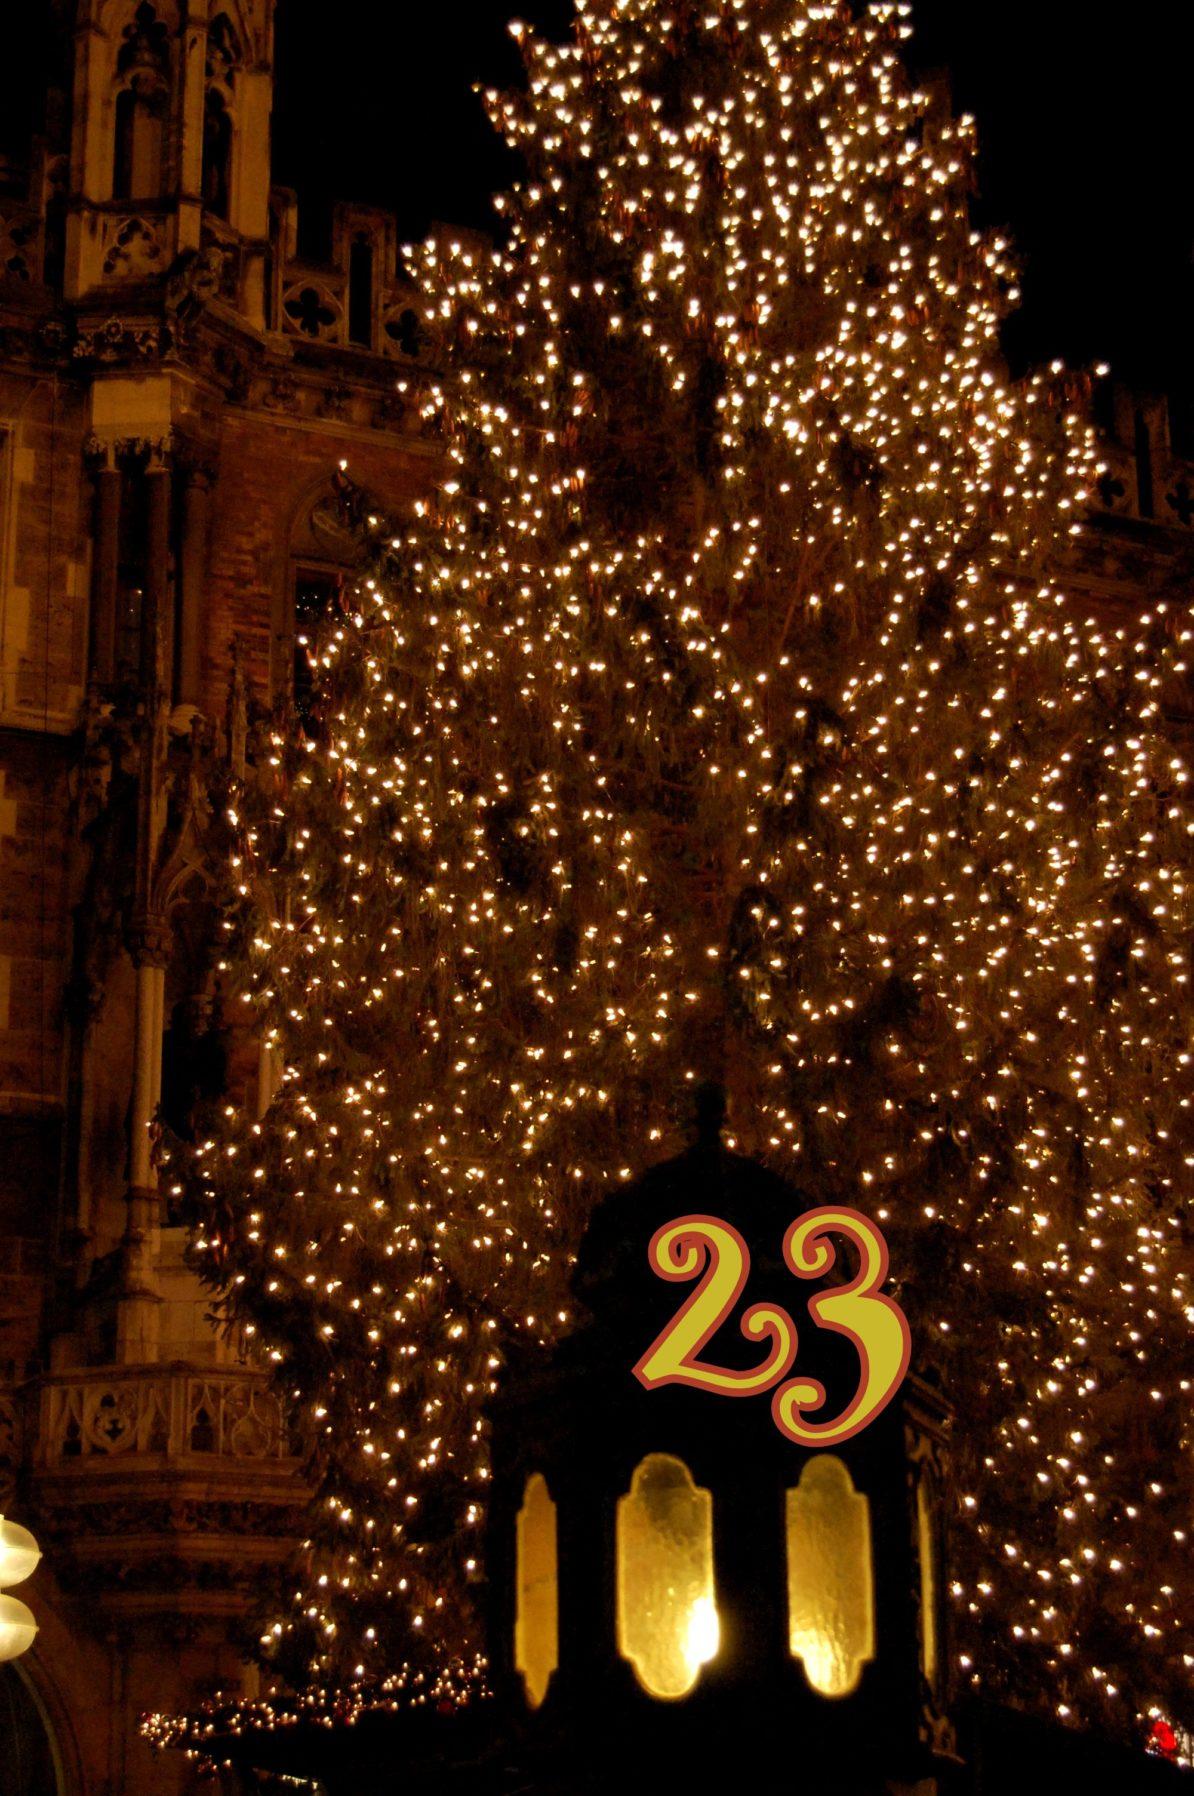 23. Dezember - Adventskalender